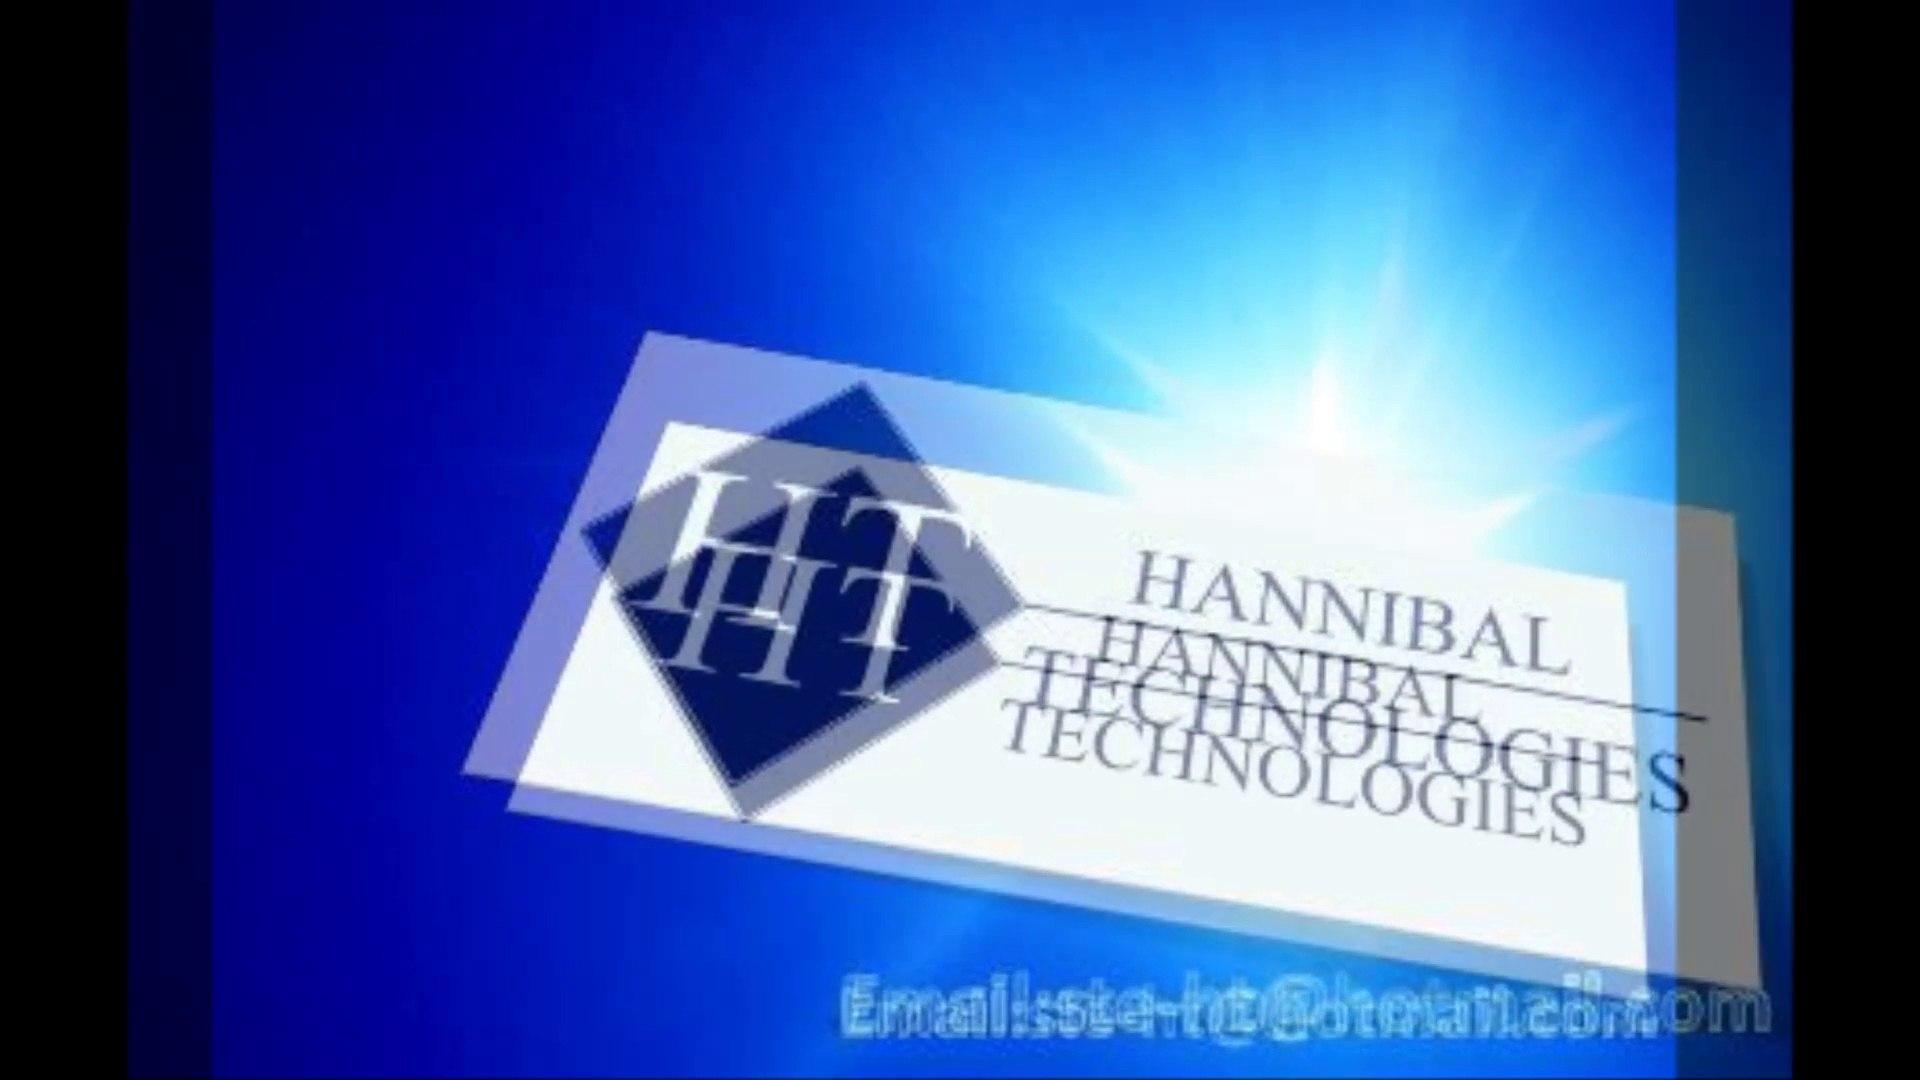 Hannibal Technologies